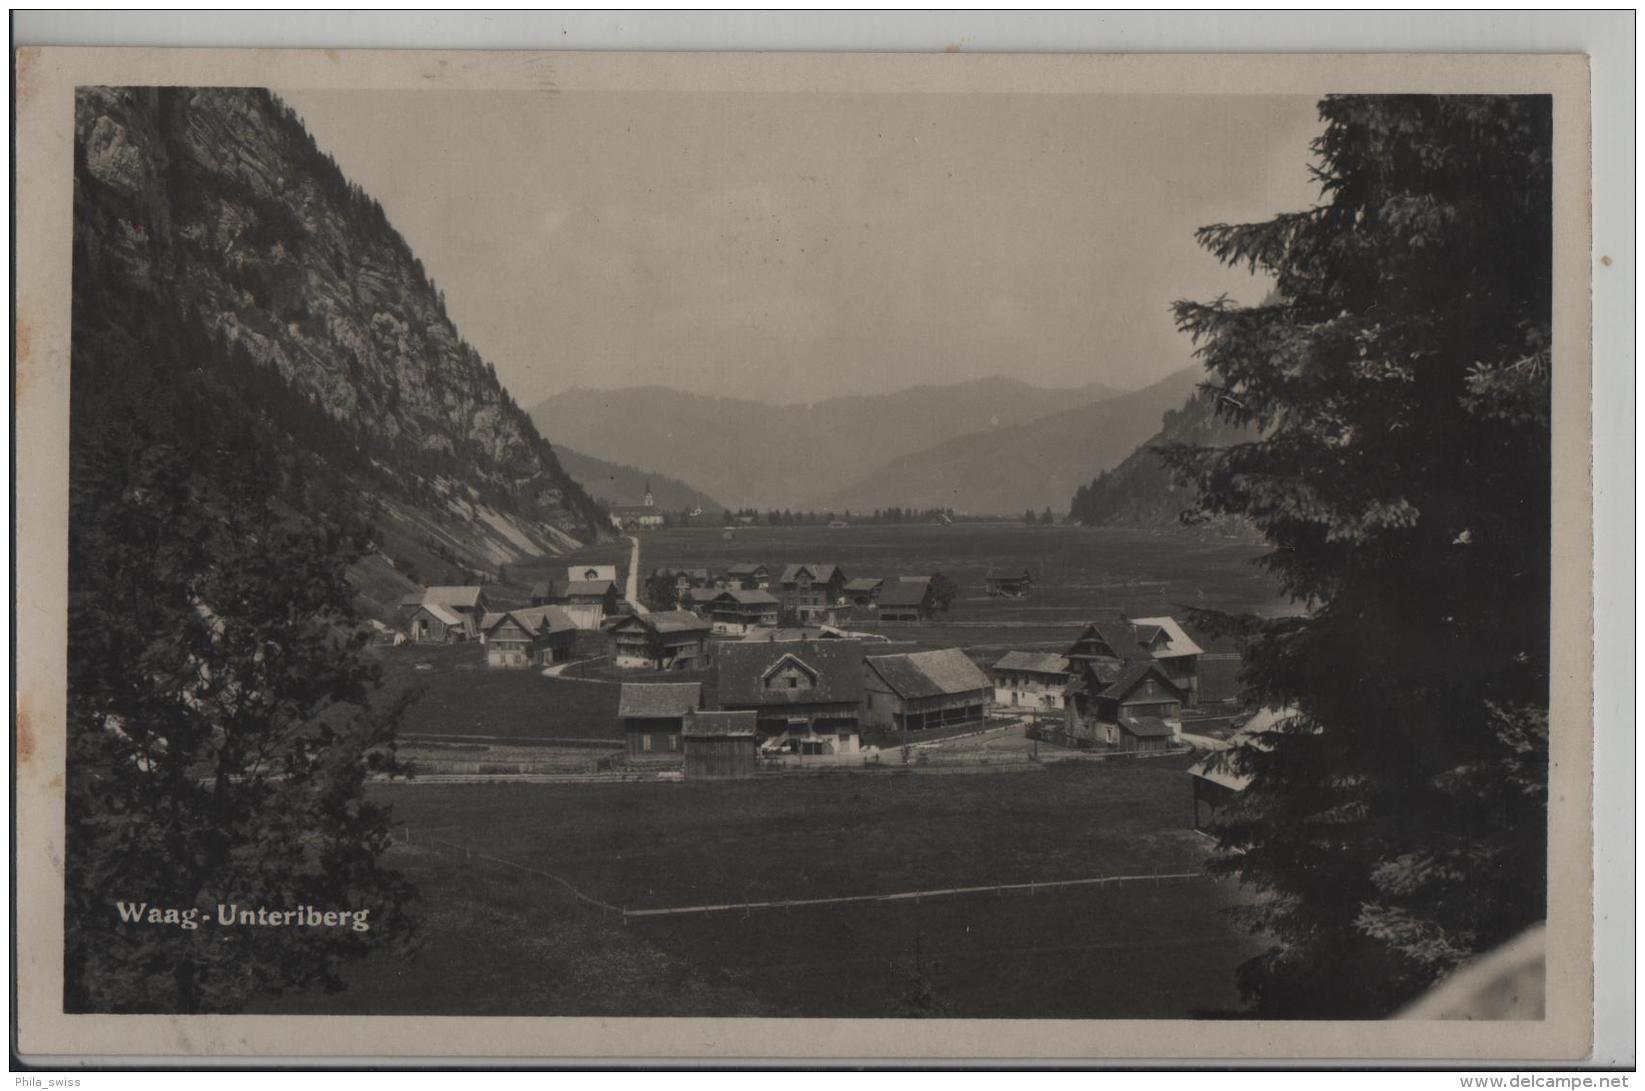 Waag-Unteriberg - Photo: Josephina Kaelin - SZ Schwyz